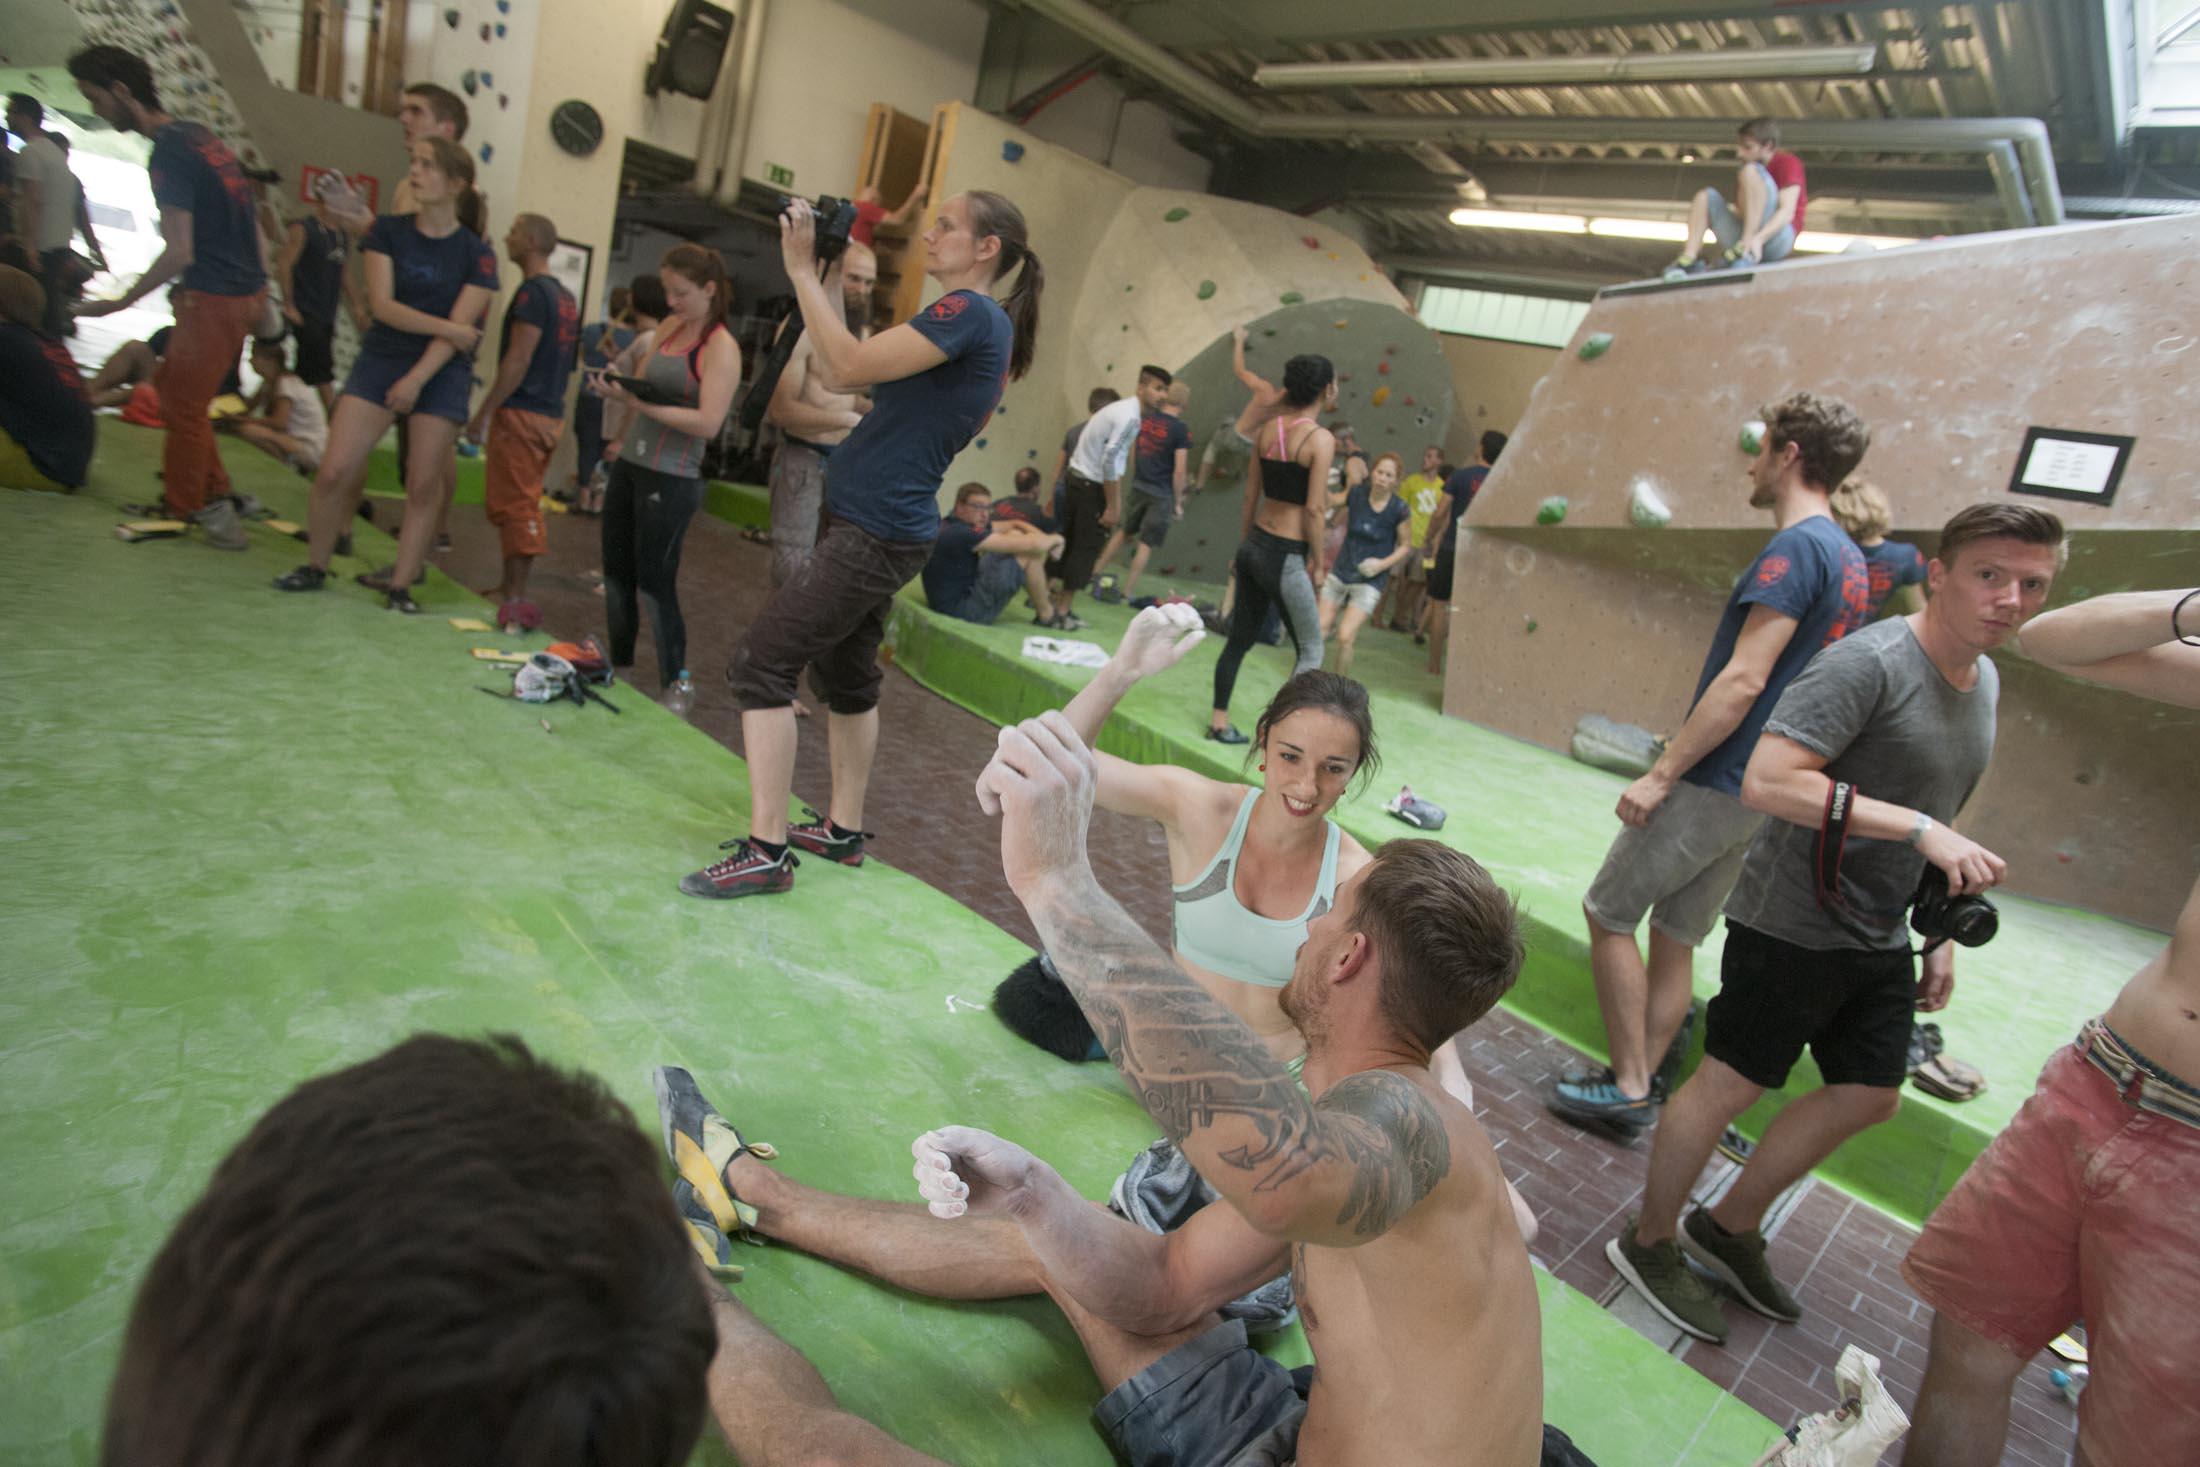 Quali, internationaler bouldercup Frankenjura 2016, BLOCKHELDEN Erlangen, Mammut, Bergfreunde.de, Boulderwettkampf07092016362